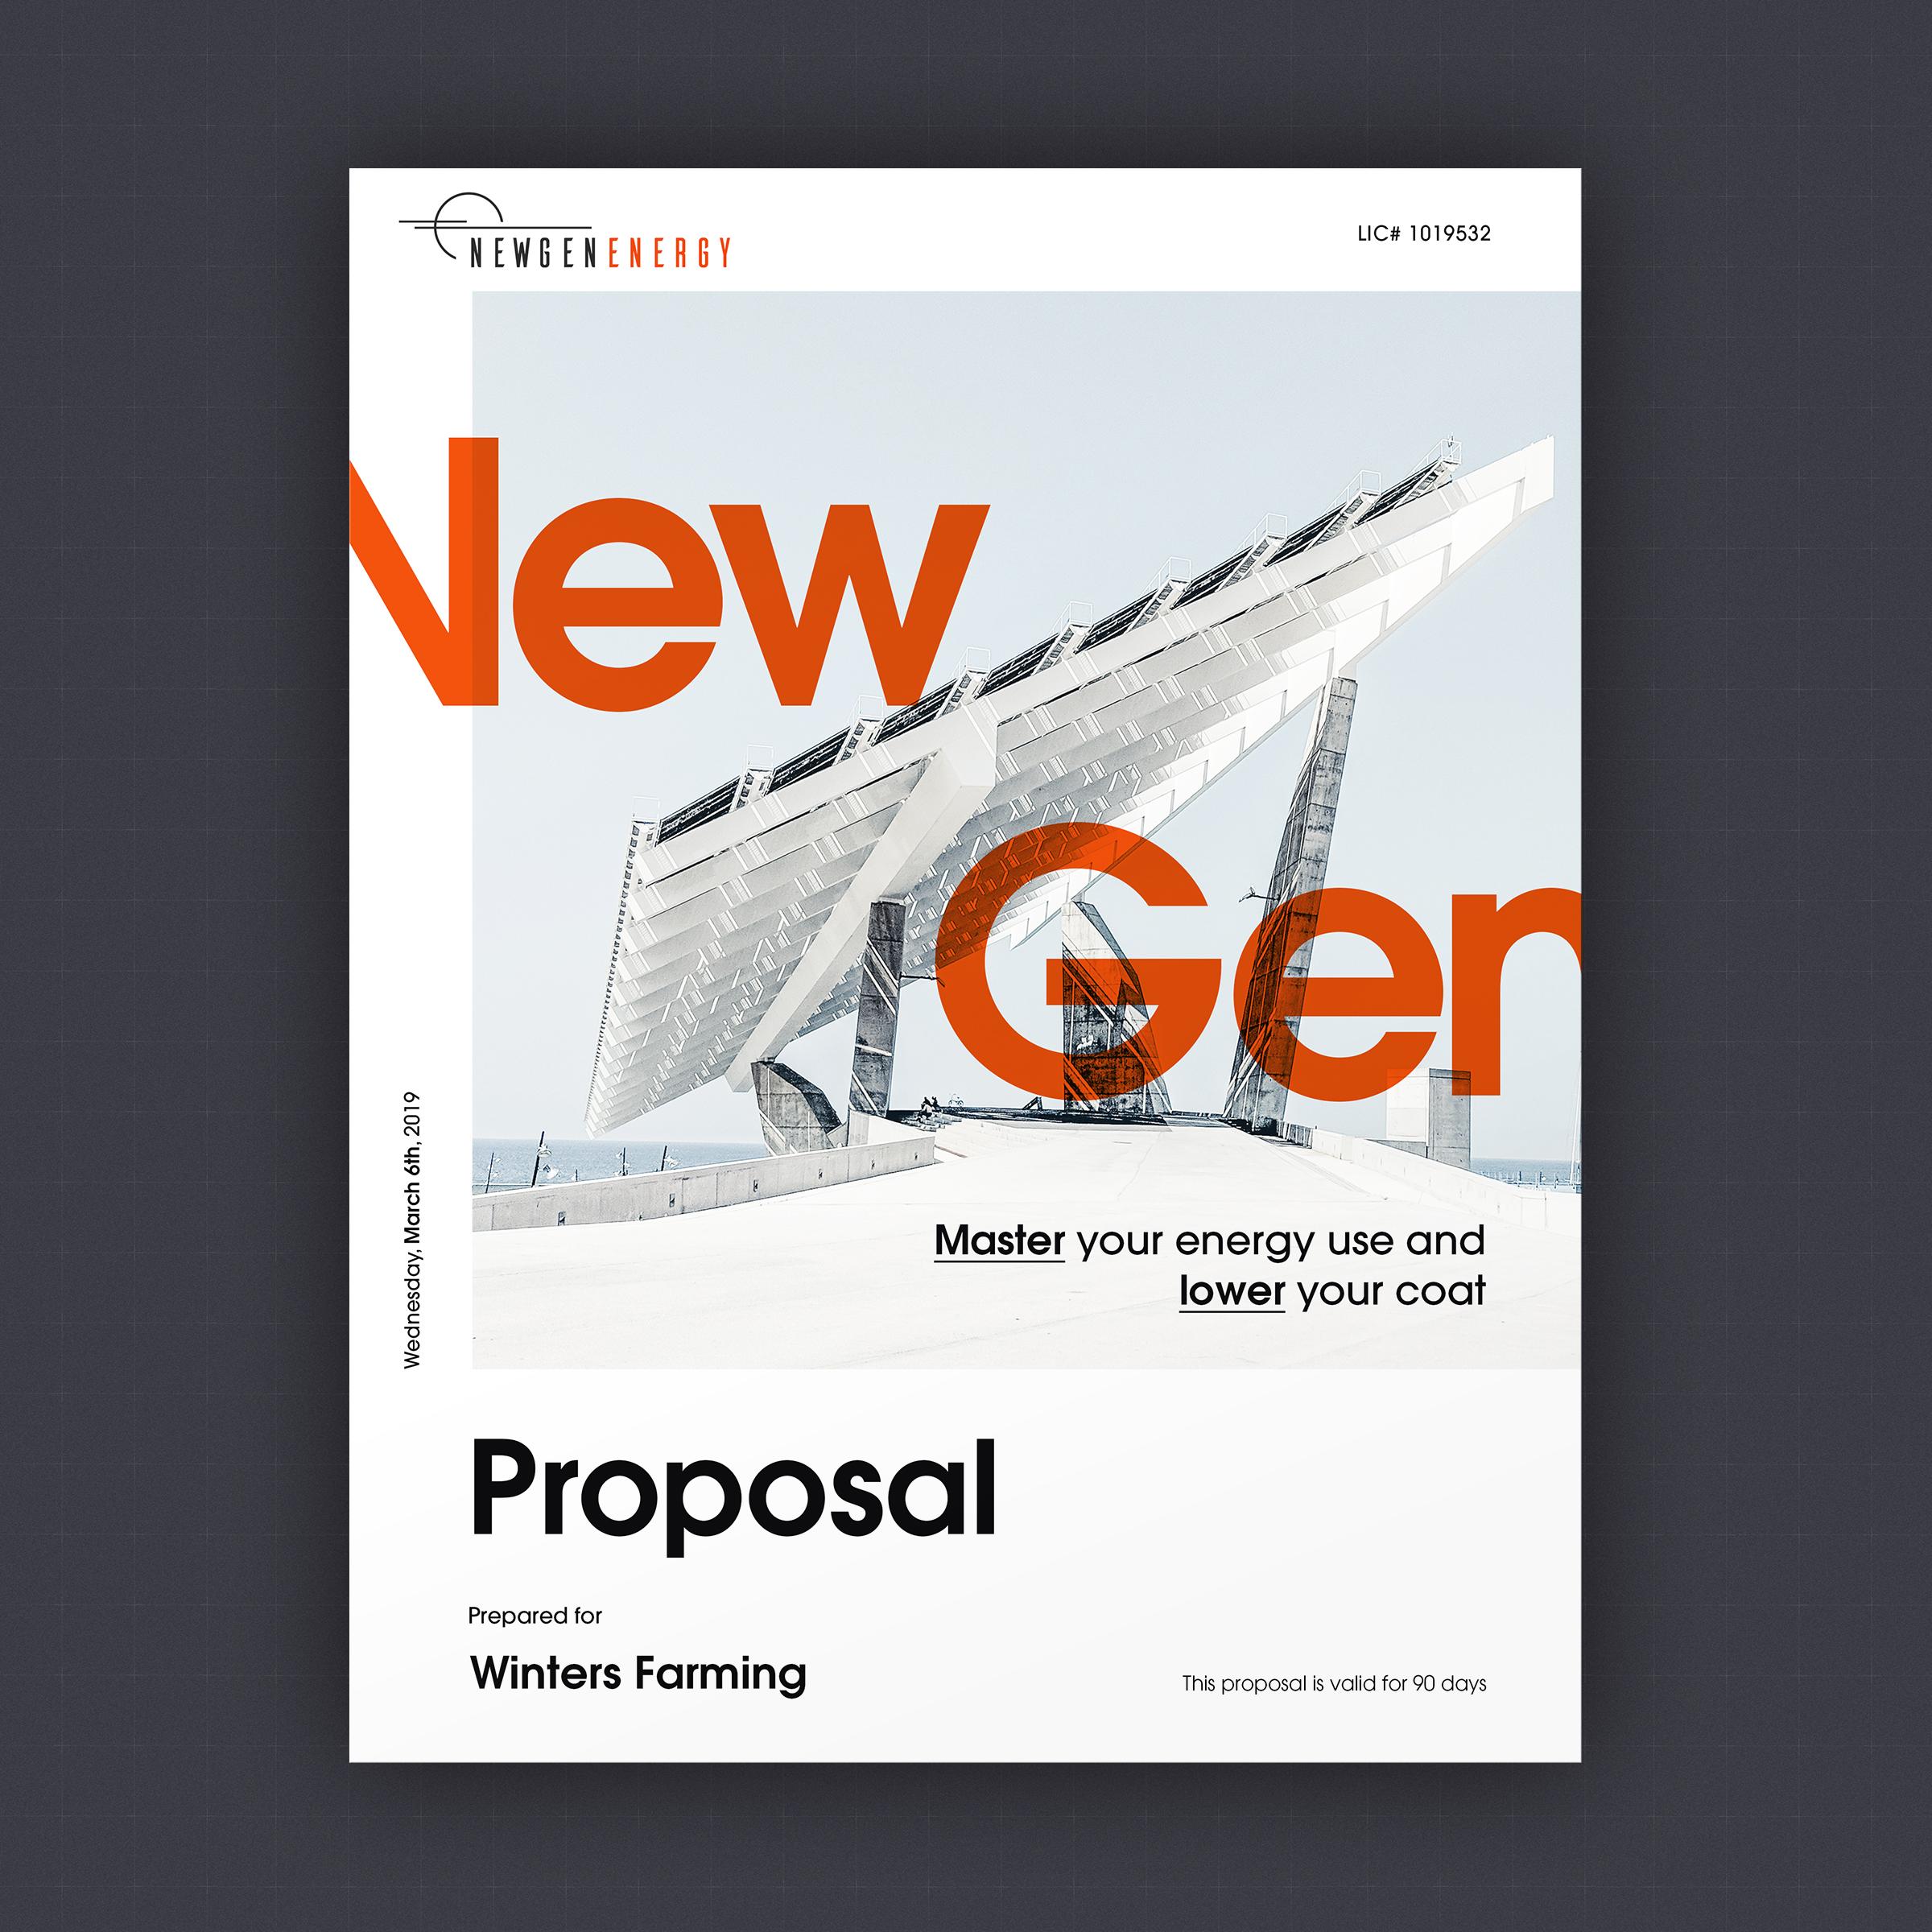 1-NewGen Proposal-Cover Opt. 1.jpg